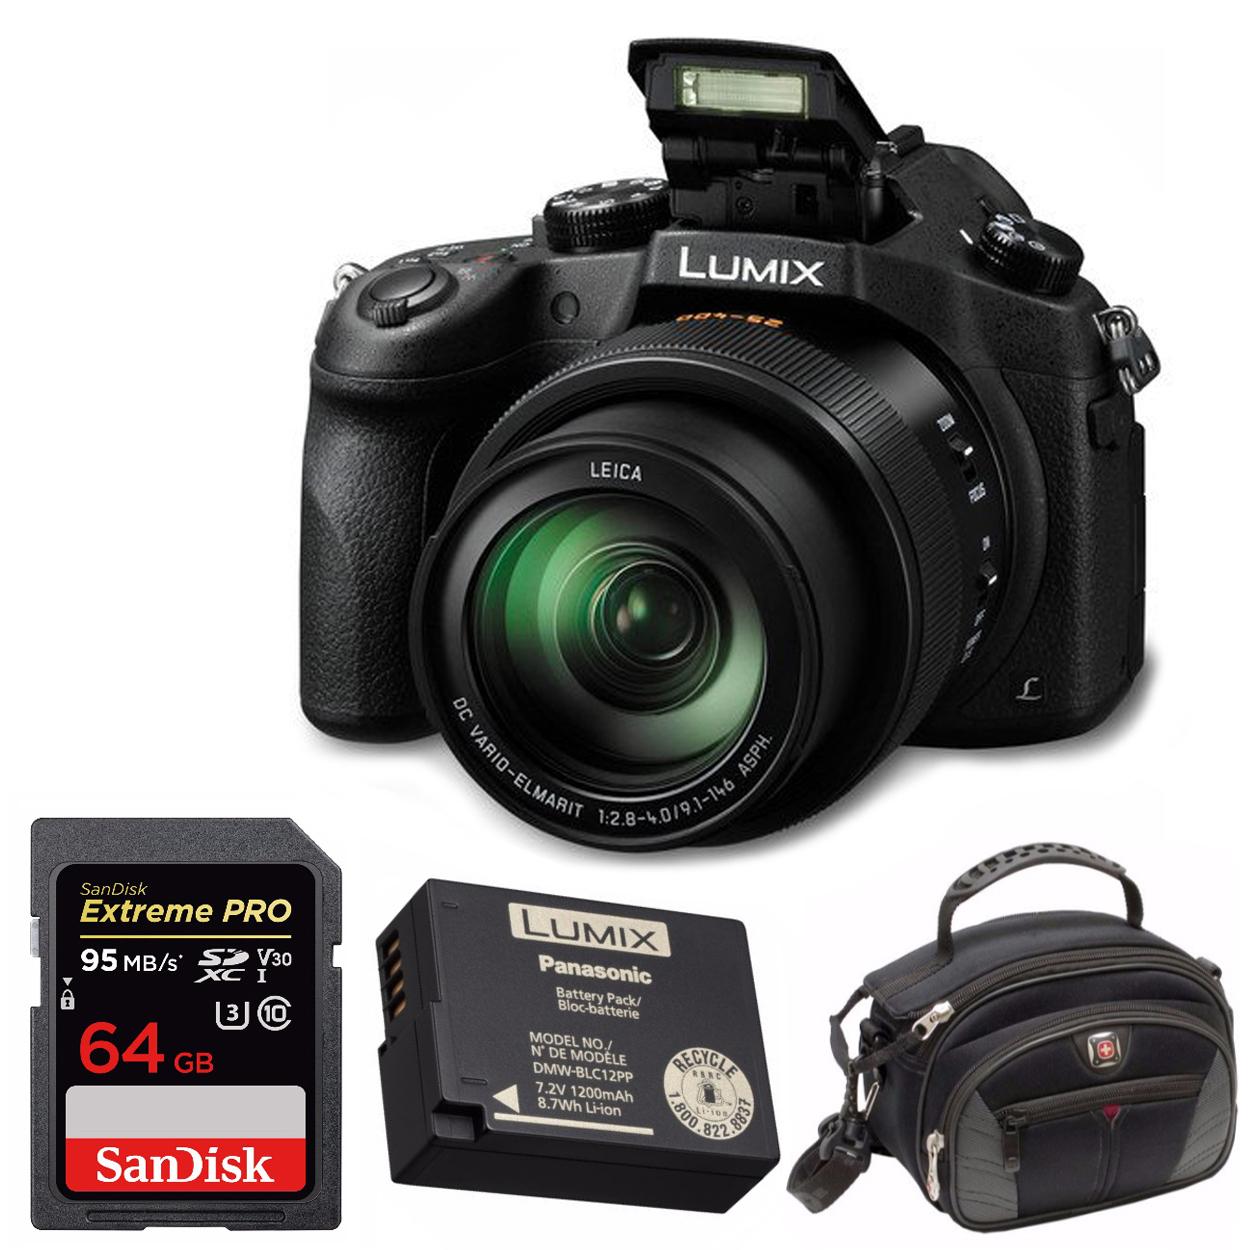 PANASONIC LUMIX FZ1000 4K Camera +Genuine DMW-BLC12 Battery + SanDisk 64GB